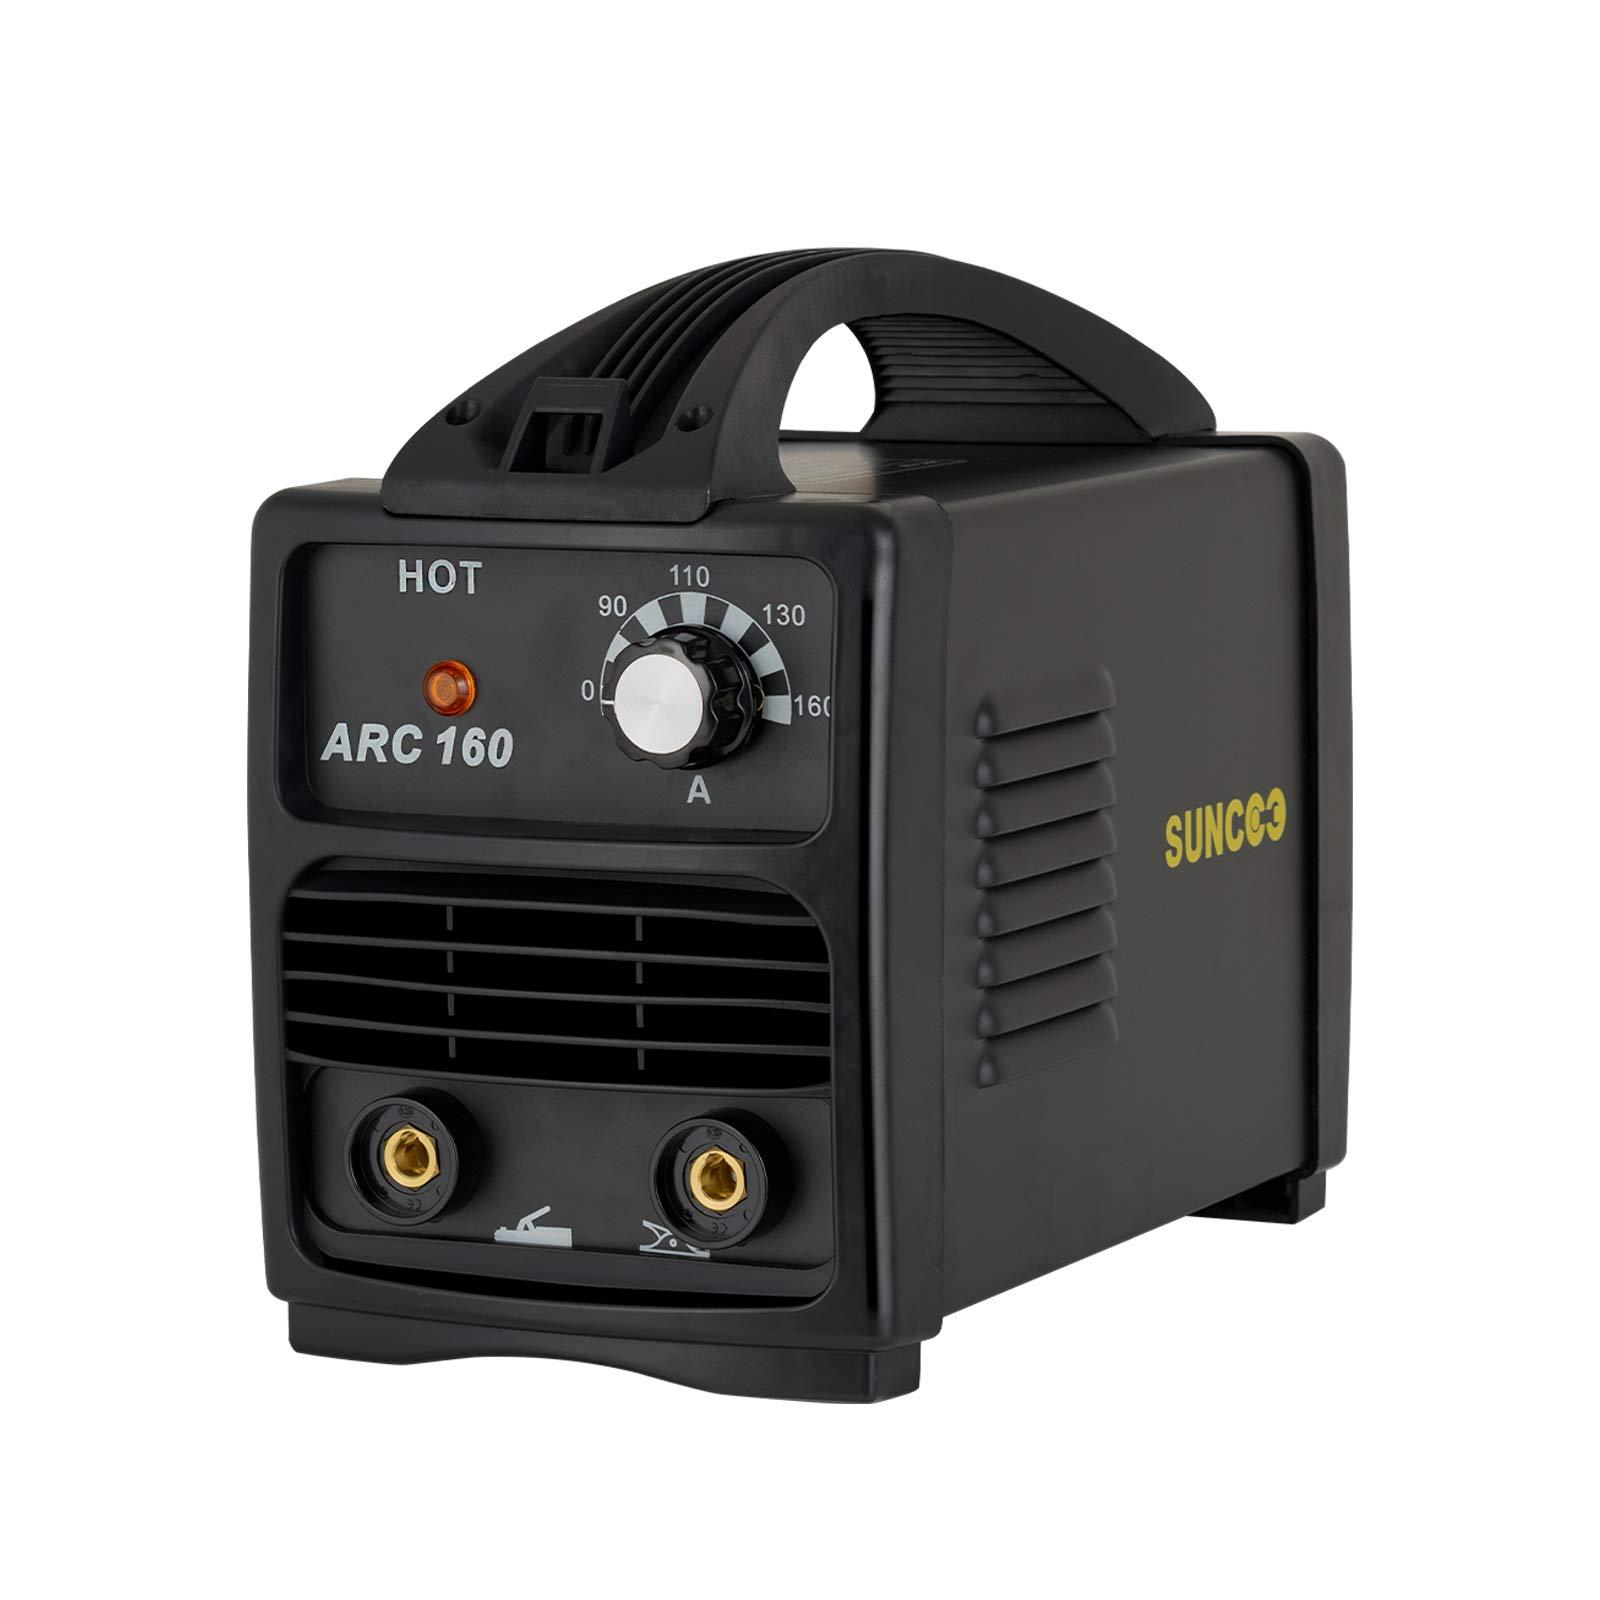 SUNCOO 160A ARC Welding Machine 110V Mini Energy-saving Portable Stick Welder with Mask and Brush Black